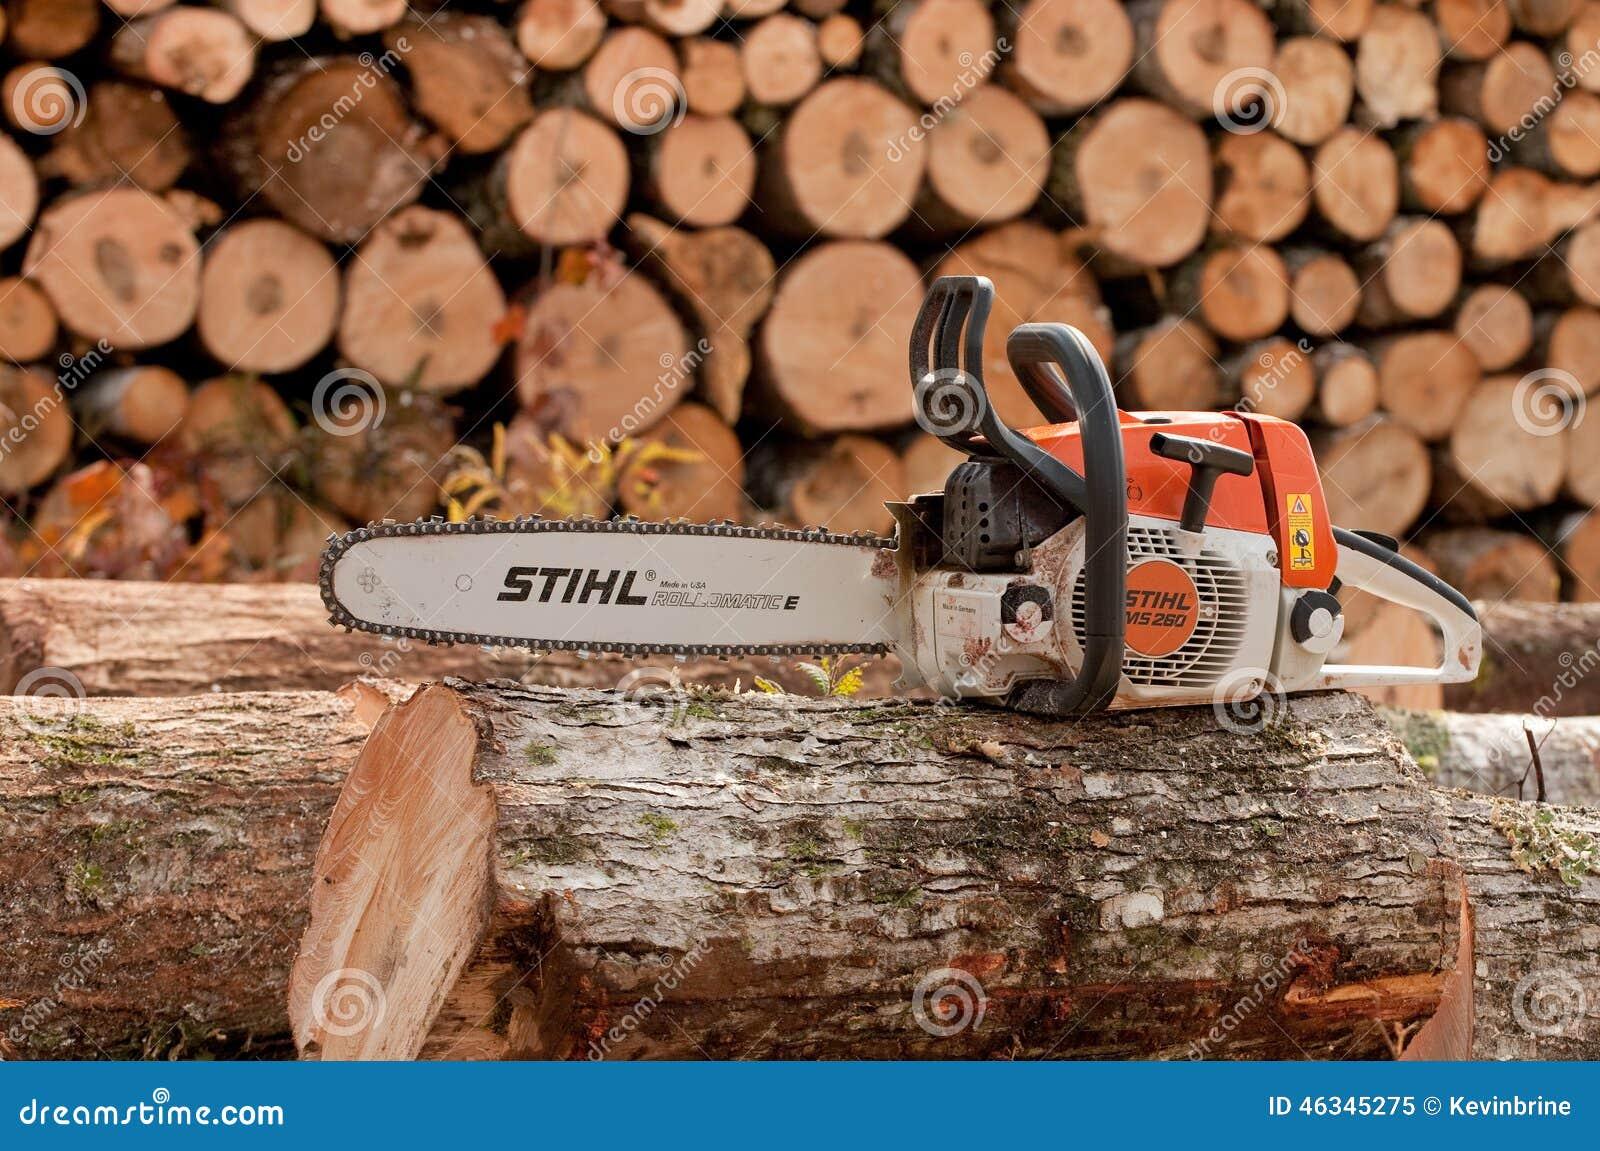 Stihl Chainsaw Editorial Image Image 46345275